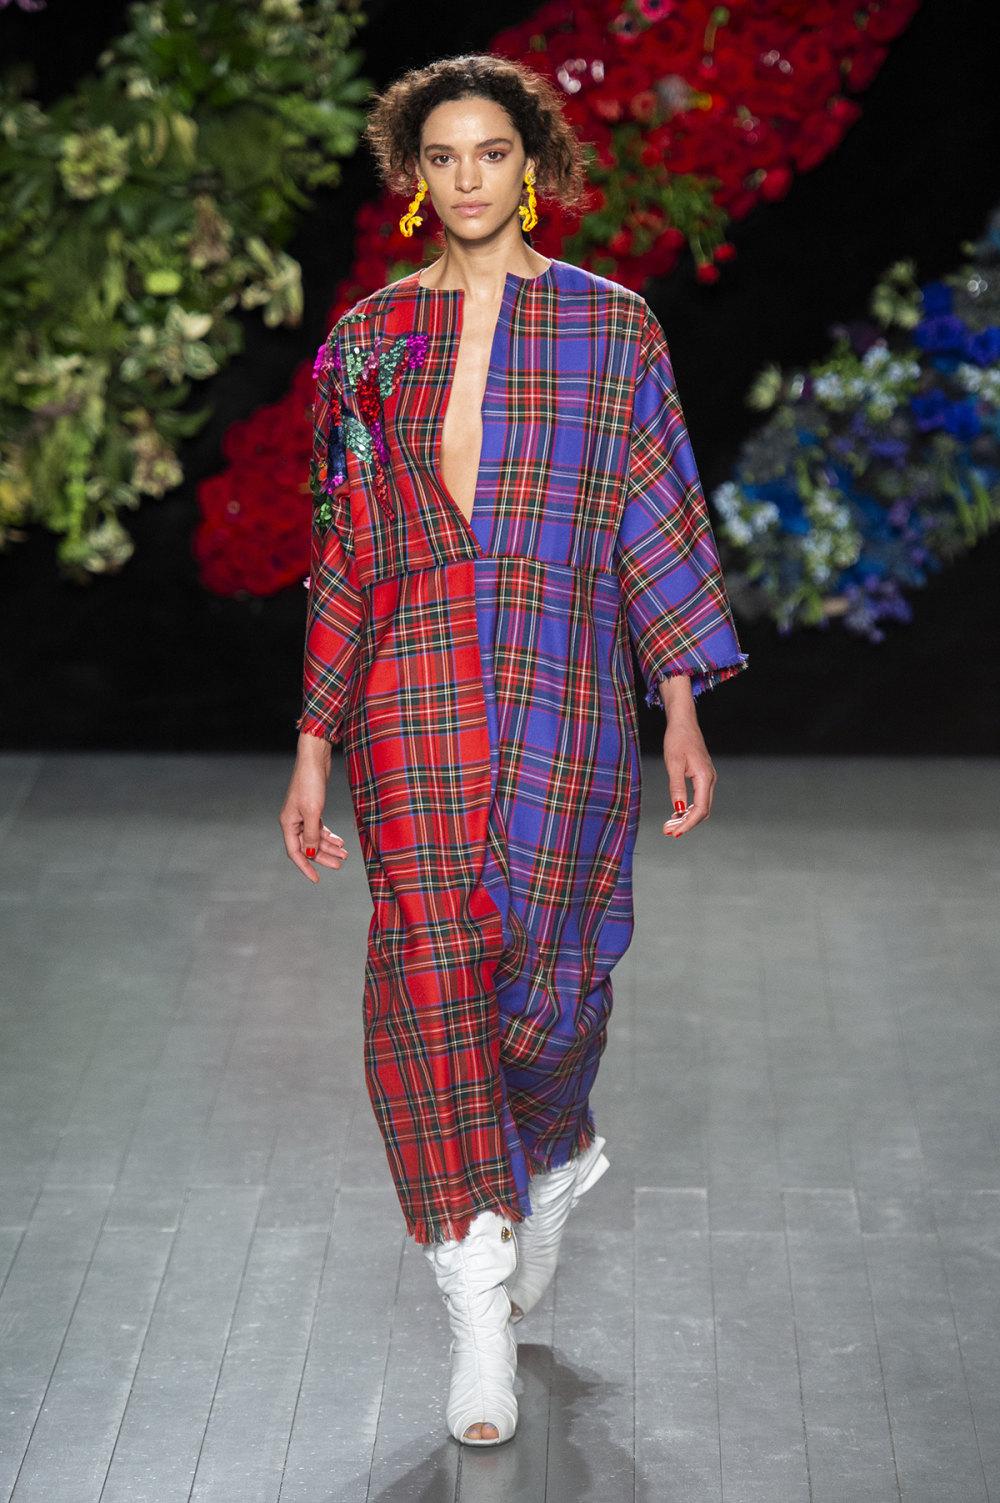 Roberta Einer时装系列格子呢西装外套收紧腰部霓虹色腰带连帽衫-12.jpg